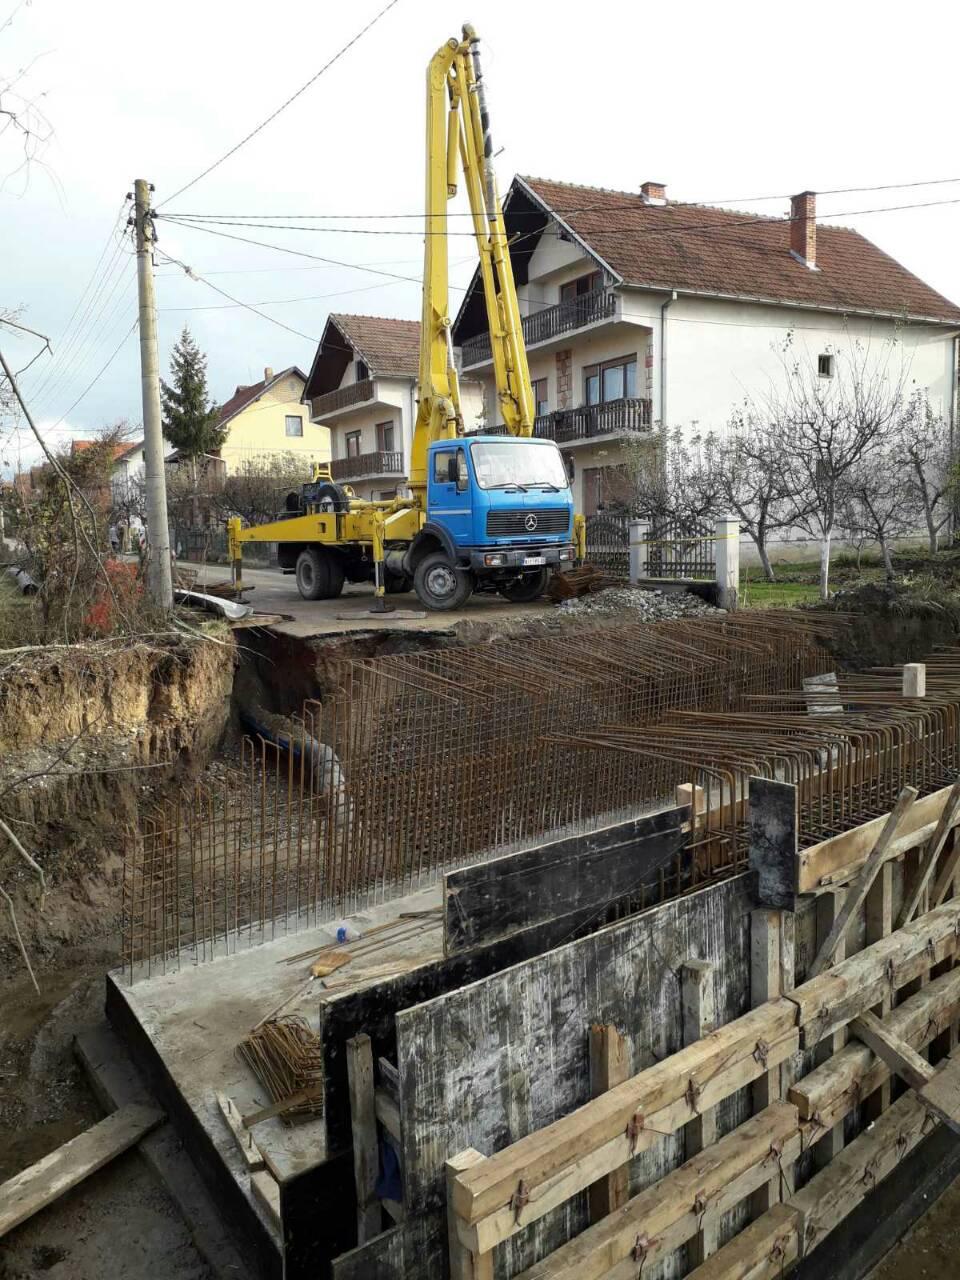 Radovi na izgradnji mosta, foto: M.M.